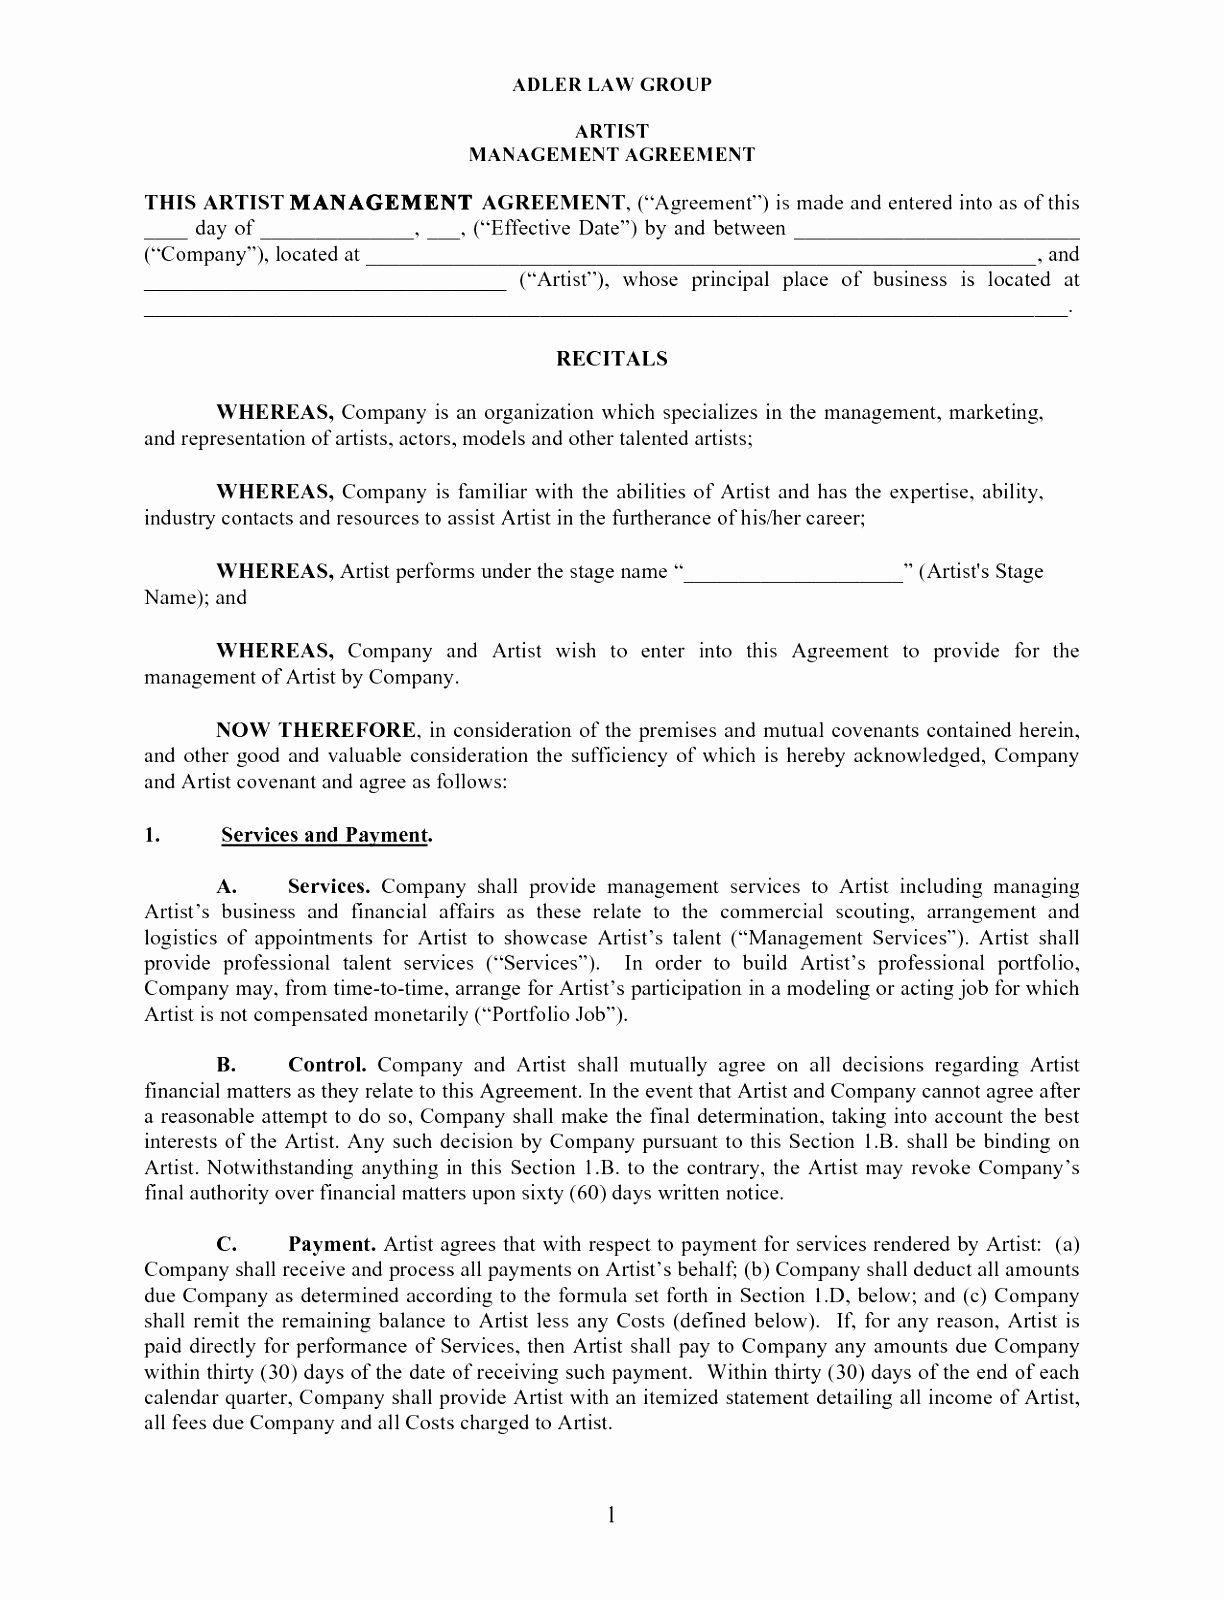 Artist Management Contract Template Elegant 6 Artist Management Contract Template Spqpe Contract Template Artist Management Business Contract Templates Artist management contract template pdf